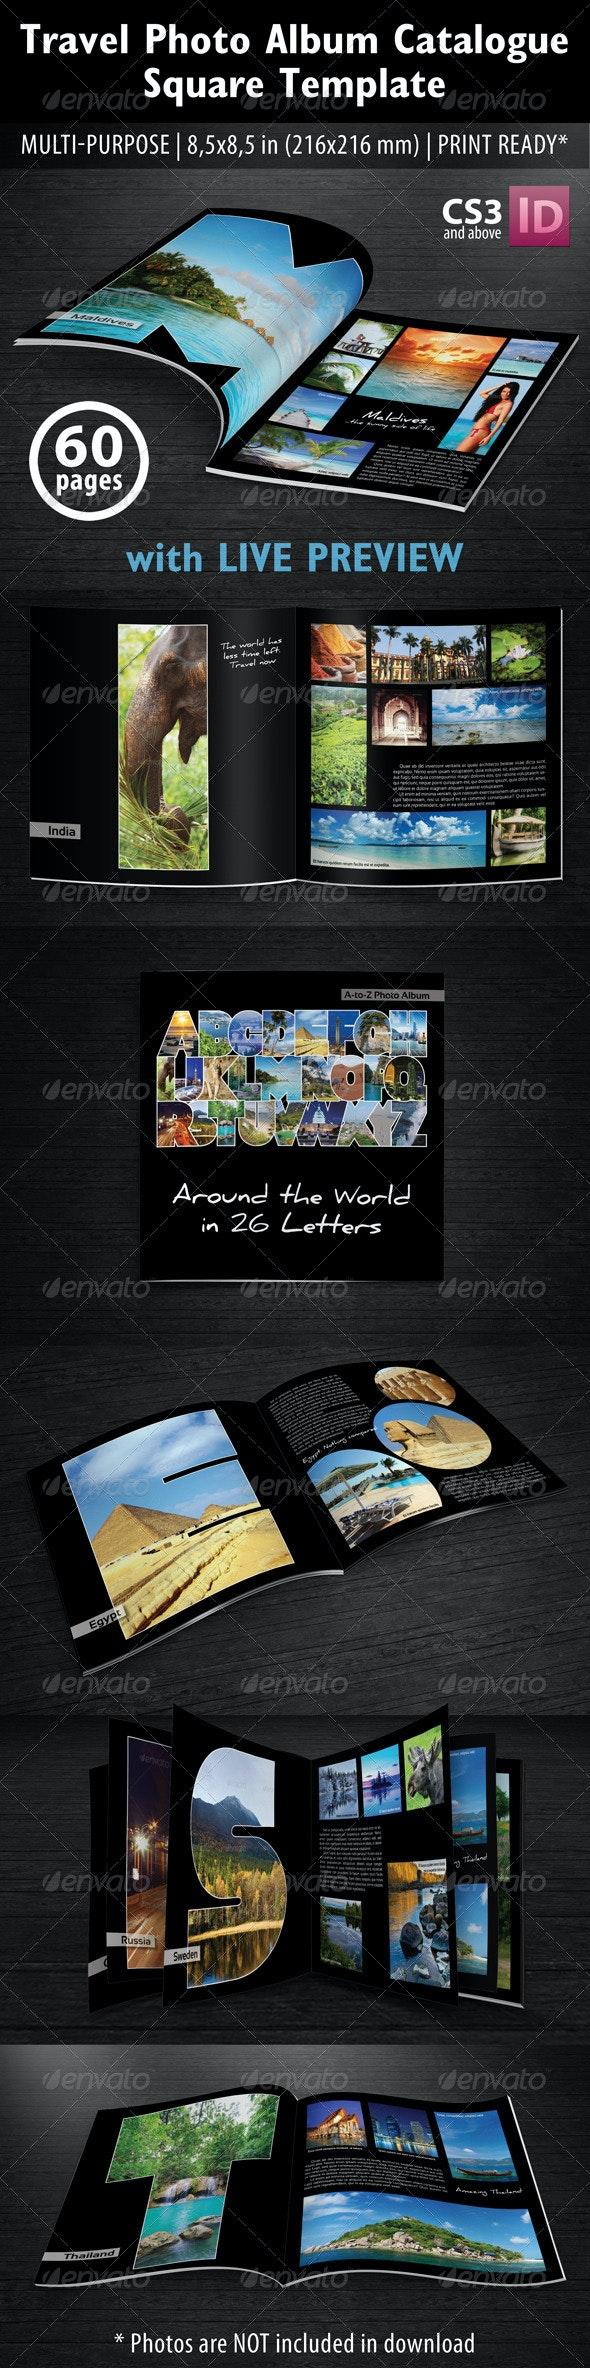 Travel Photo Album Catlog. Square Template - Photo Albums Print Templates